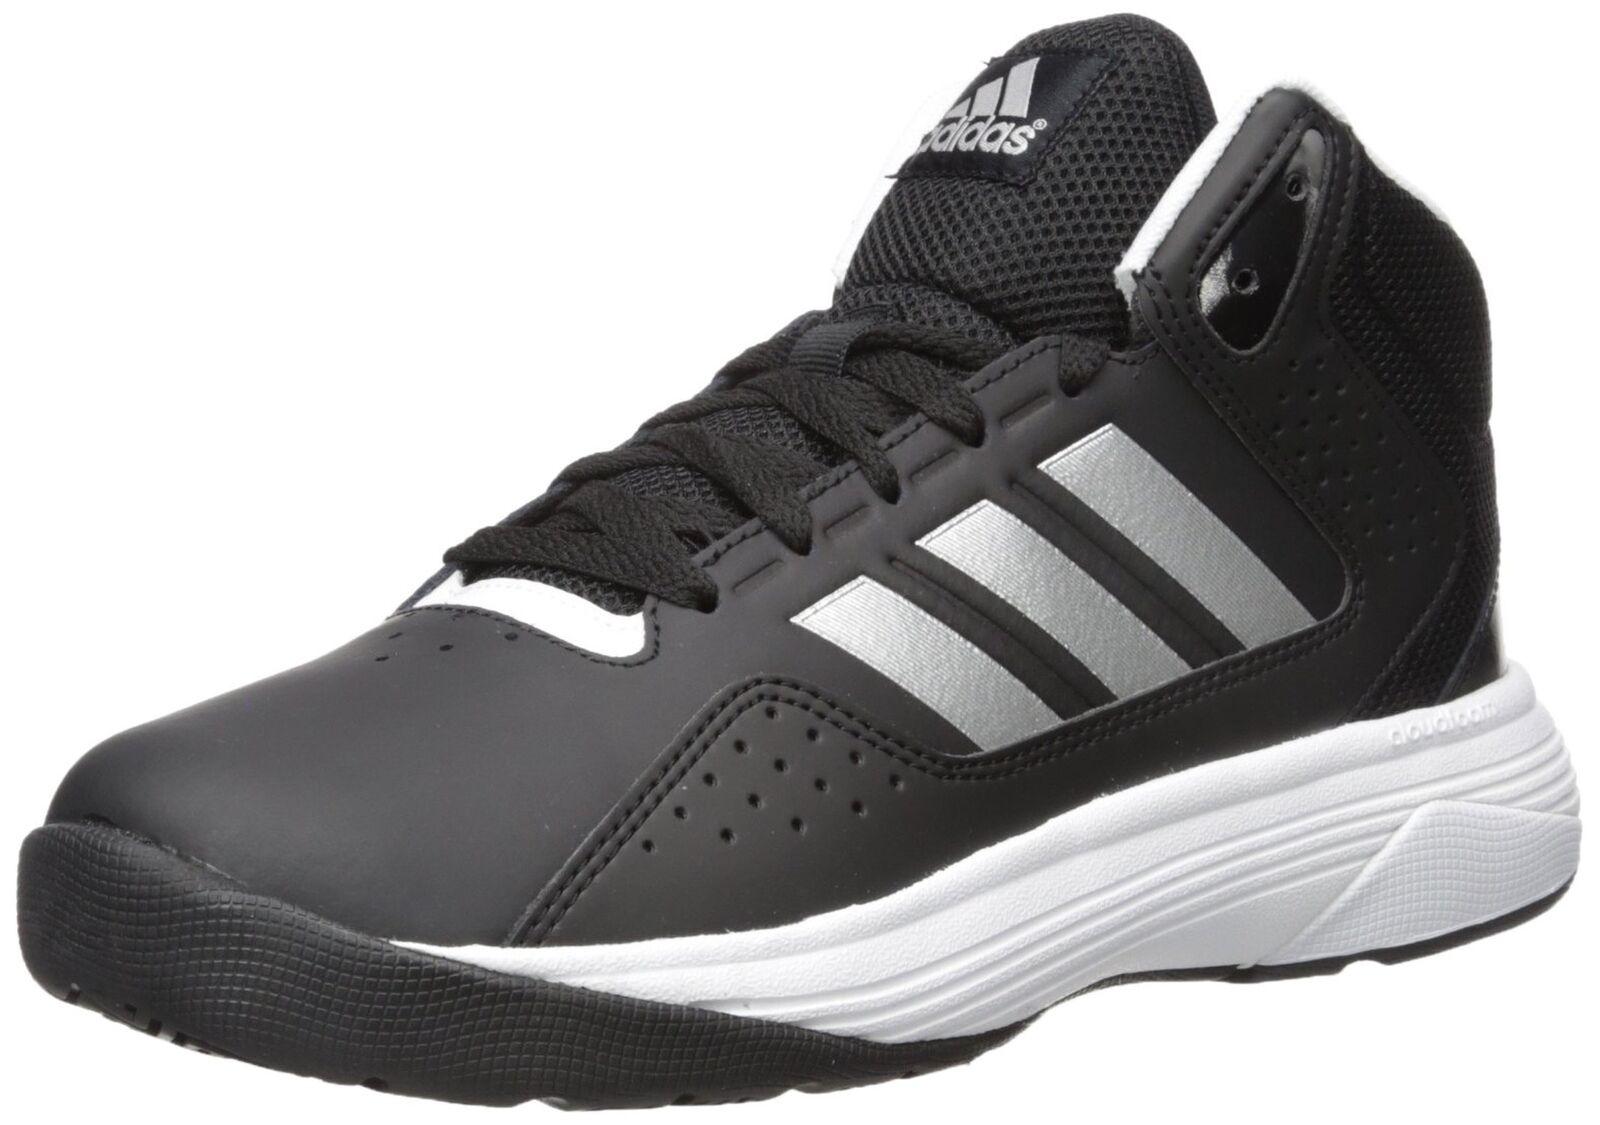 Adidas NEO Men's Cloudfoam Ilation Mid Wide Basketball shoes 9 2E US